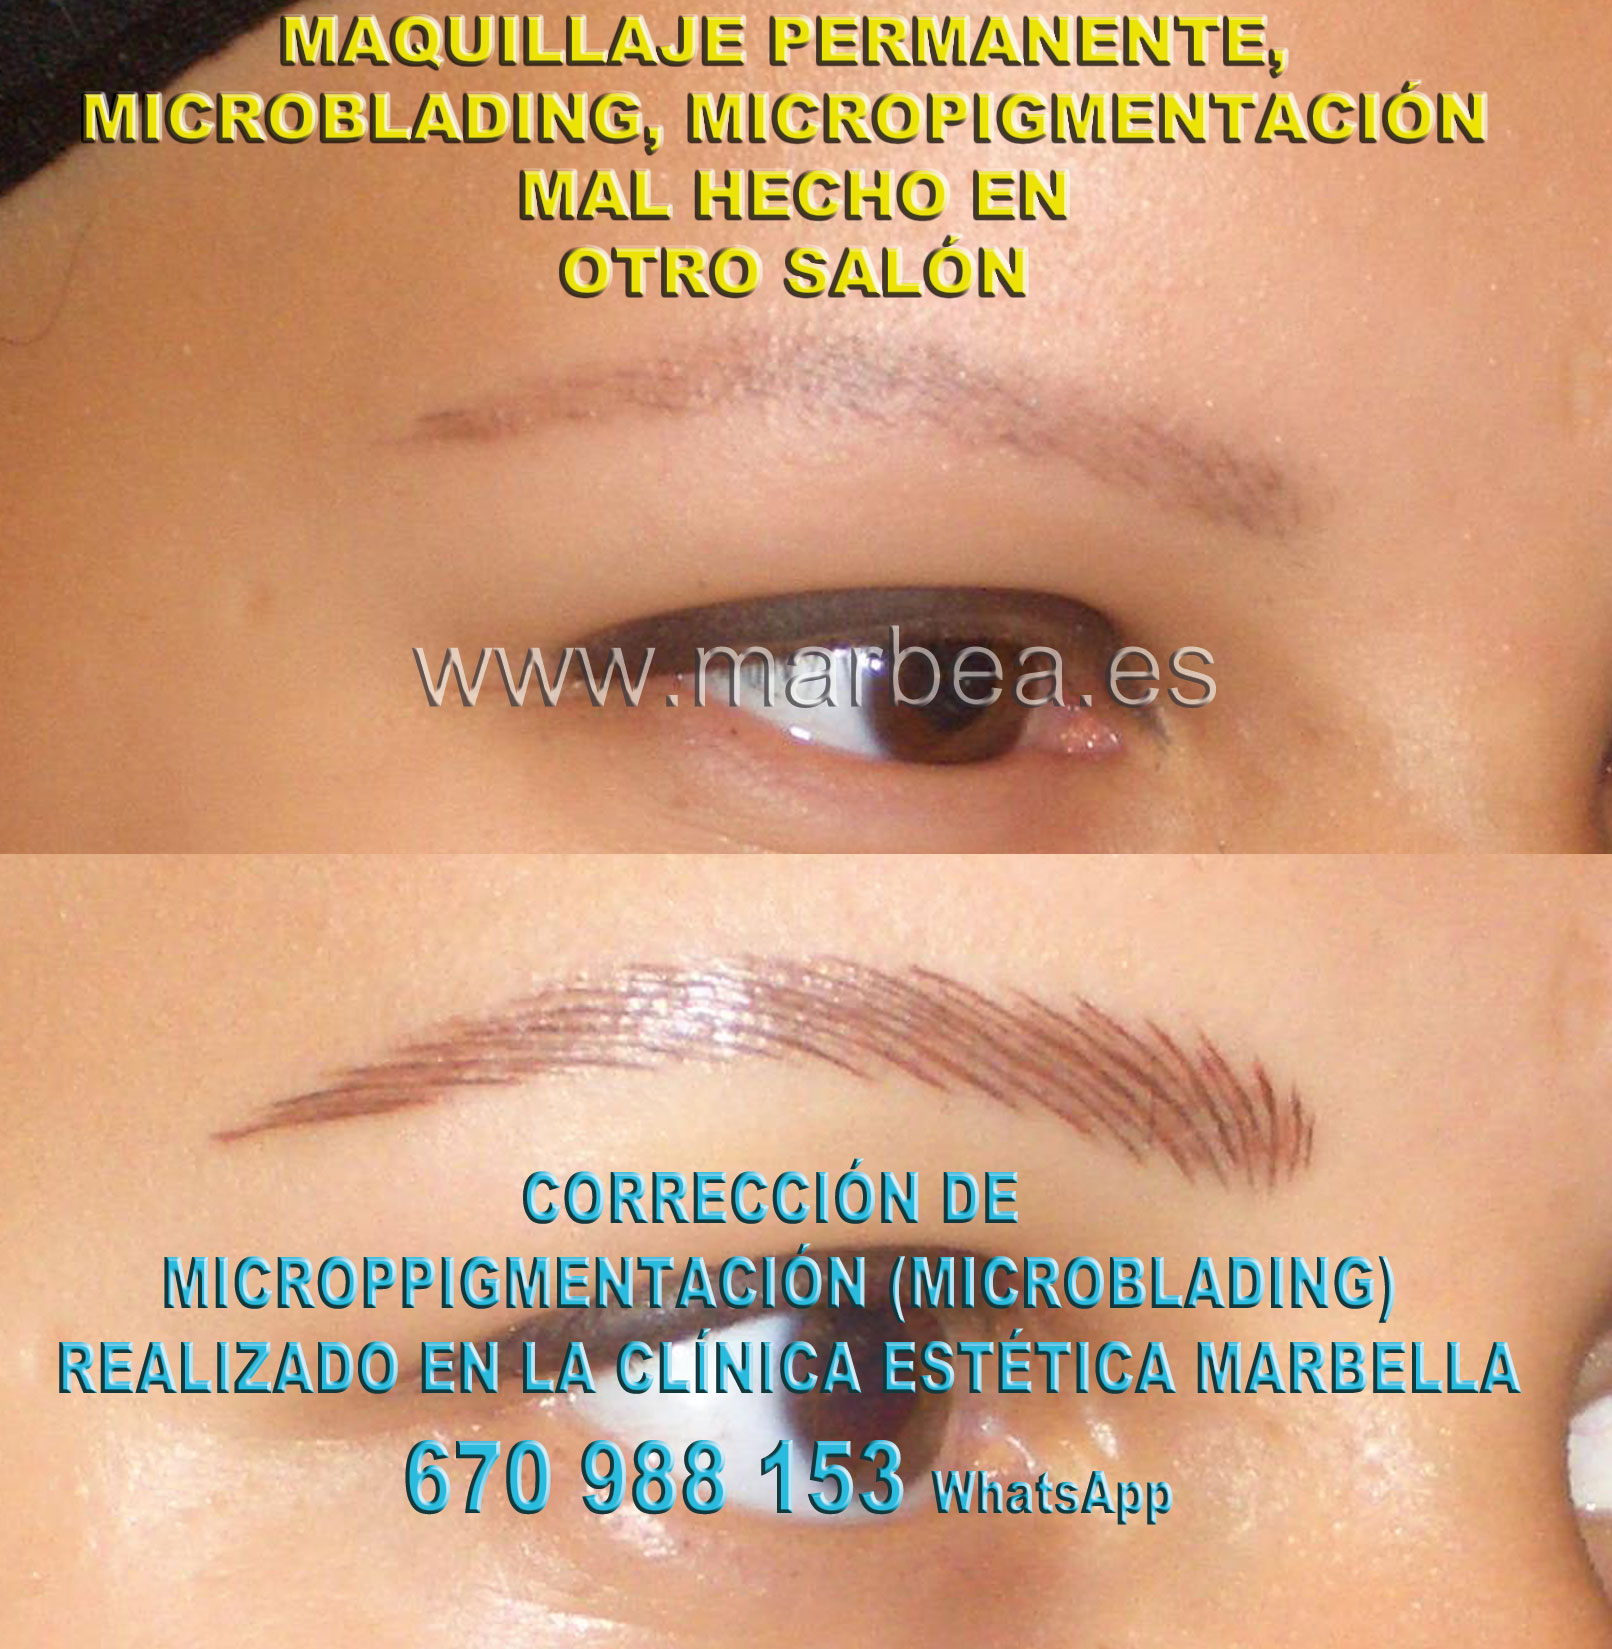 ELIMINAR TATUAJE CEJAS clínica estética maquillaje semipermanente ofrenda como aclarar la micropigmentación cejas,micropigmentación correctiva cejas mal hecha